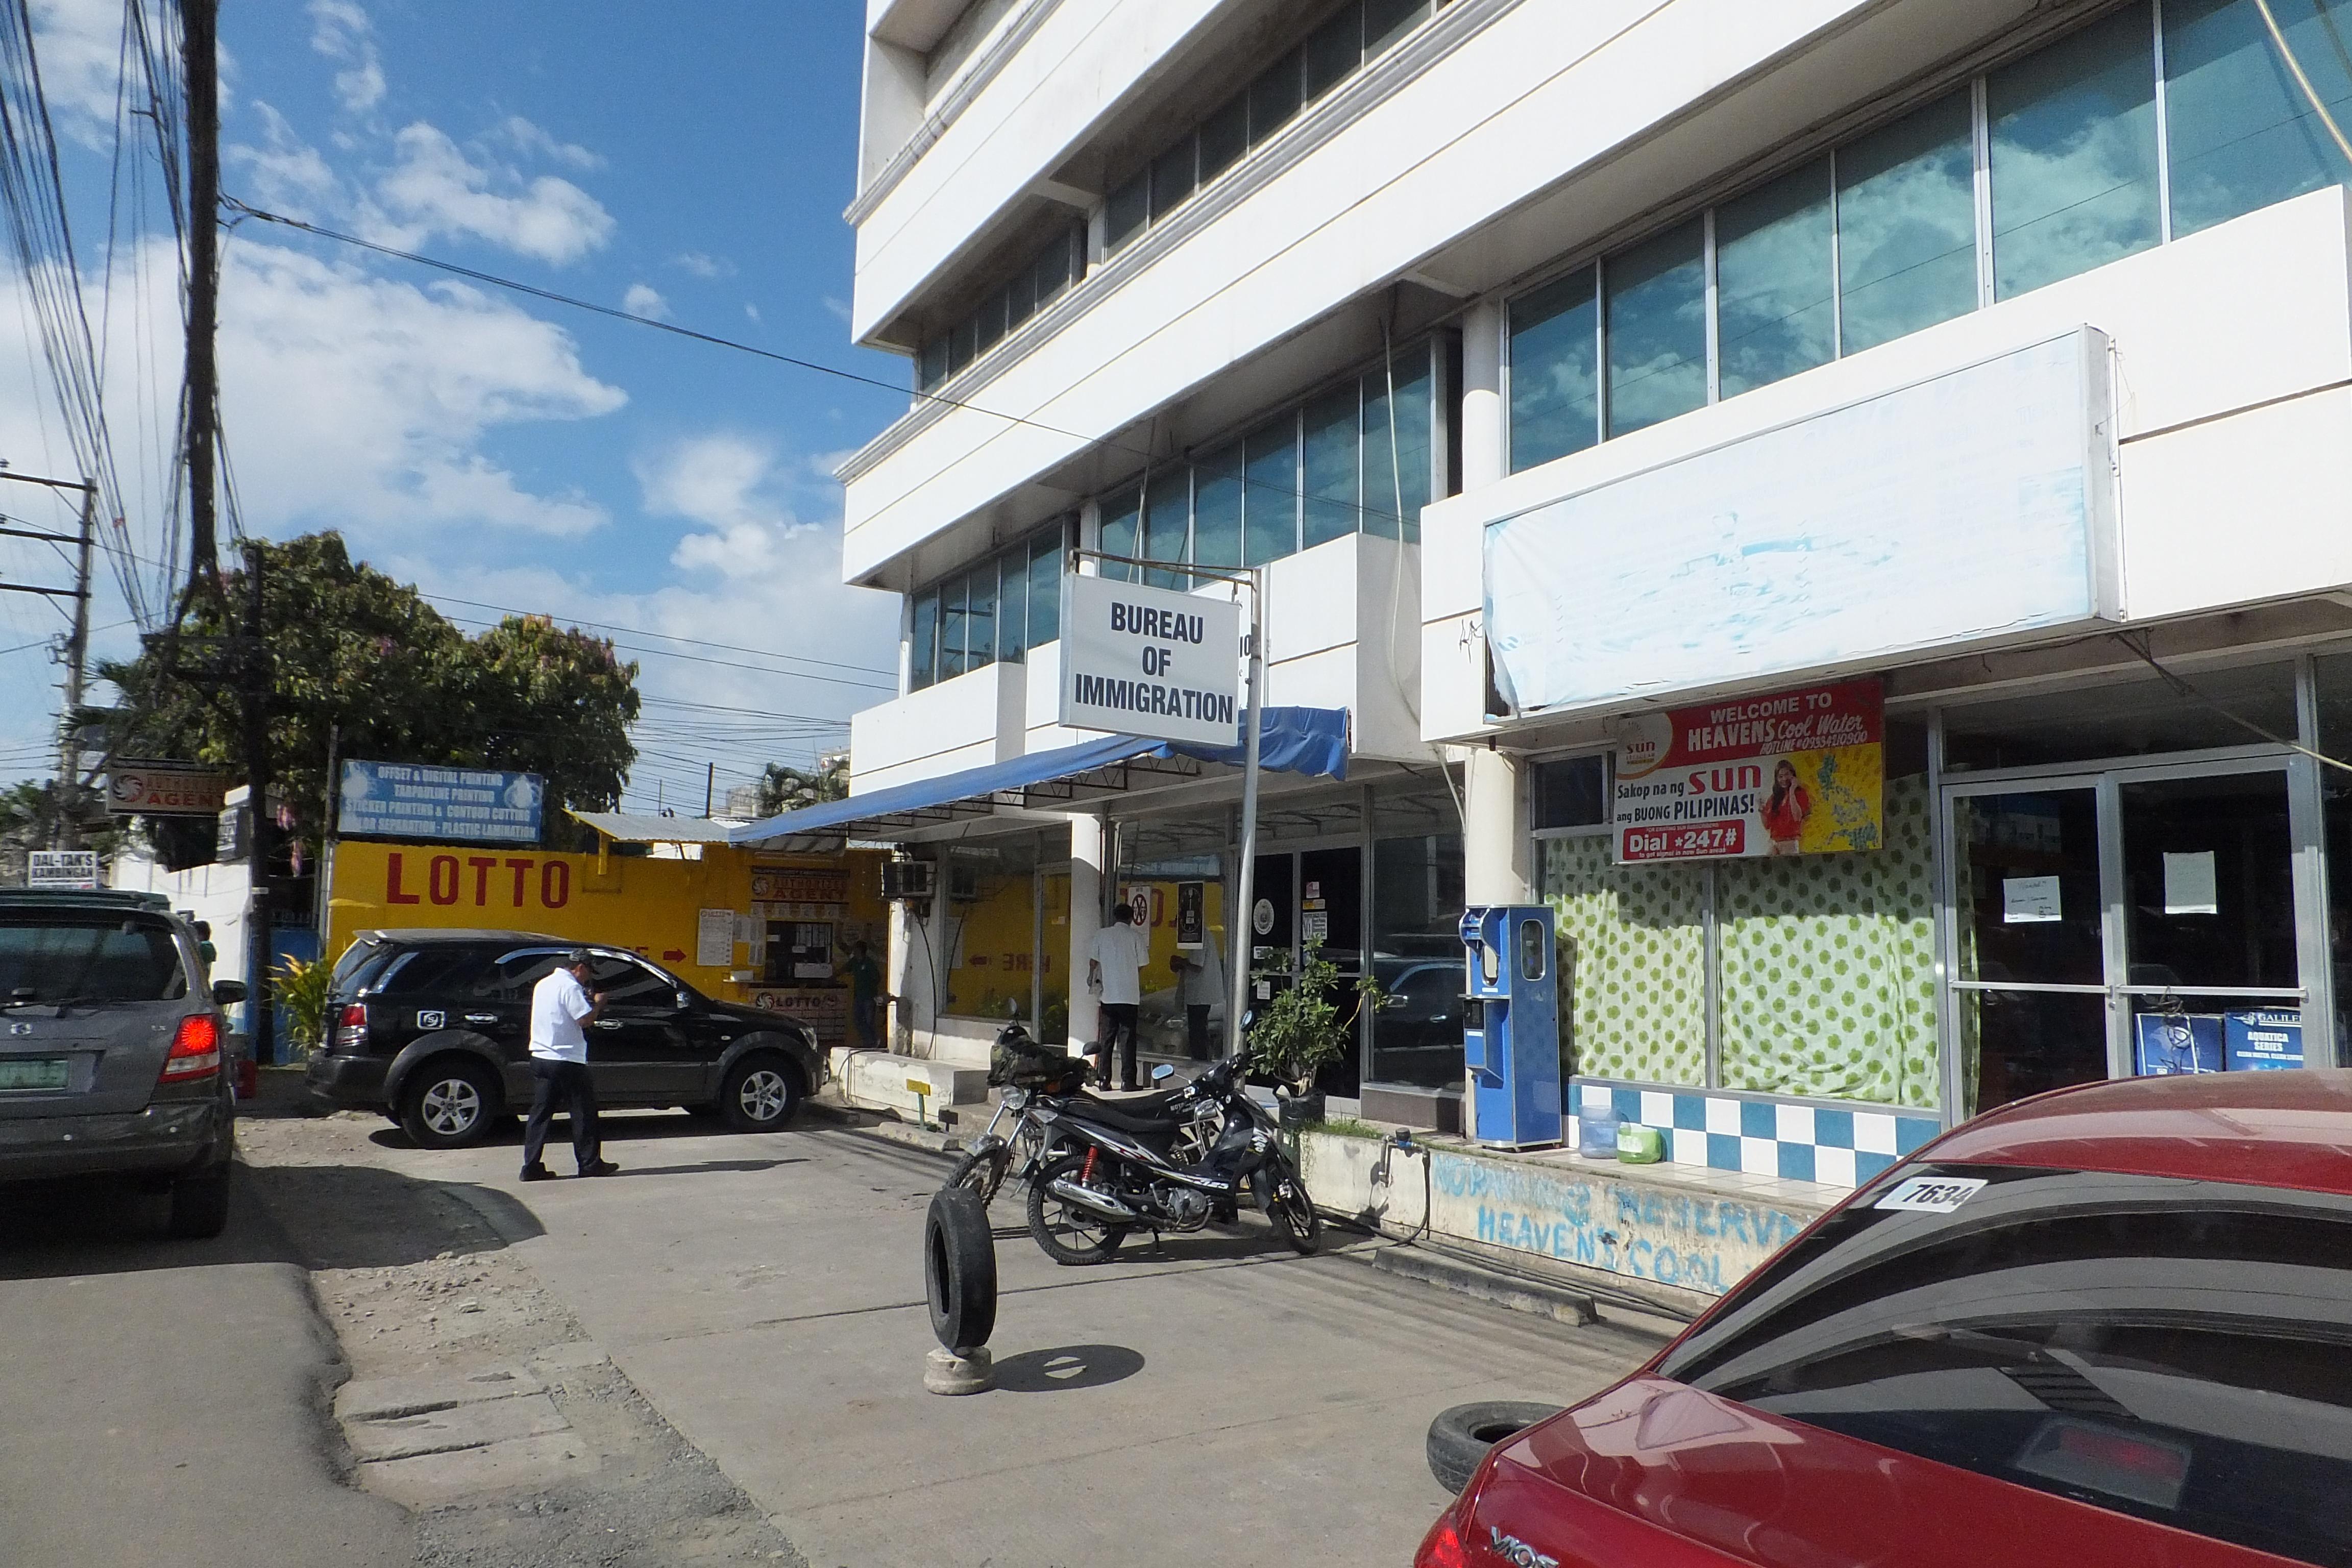 Bureau of immigration cagayan de oro city misamis oriental